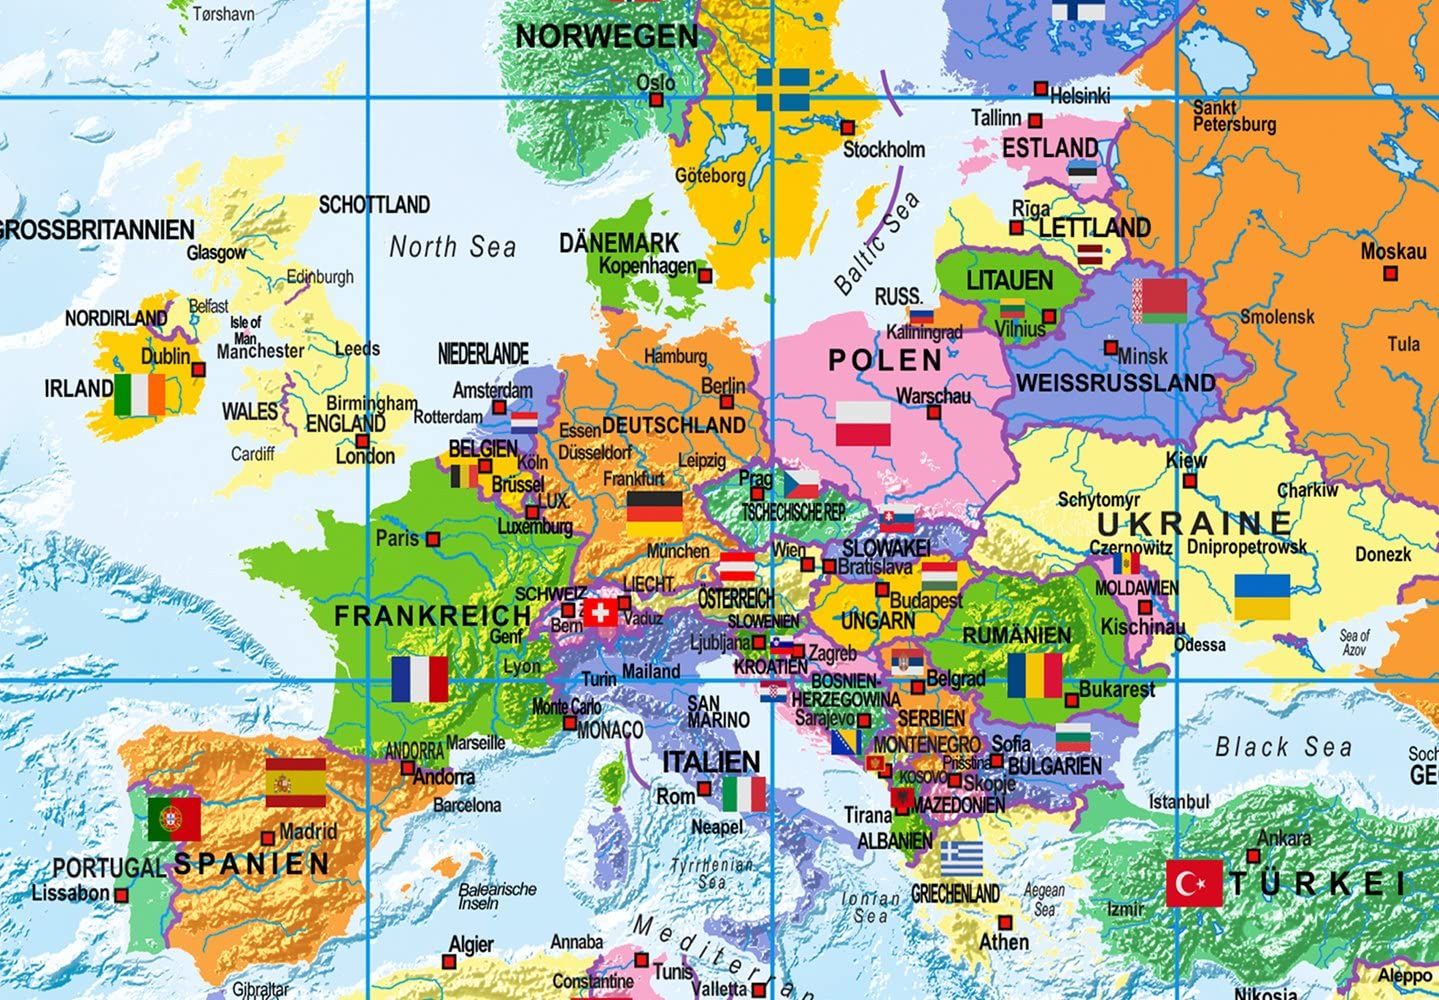 murando englische Weltkarte Pinnwand /& Vlies Leinwand Bild 90x60 cm XXL Bilder mit Kork R/ückwand Set mit 50 Markierf/ähnchen-Pinnnadeln Korktafel Kunstdruck Wandbilder Lernkarte Landkarte k-A-0205-p-a